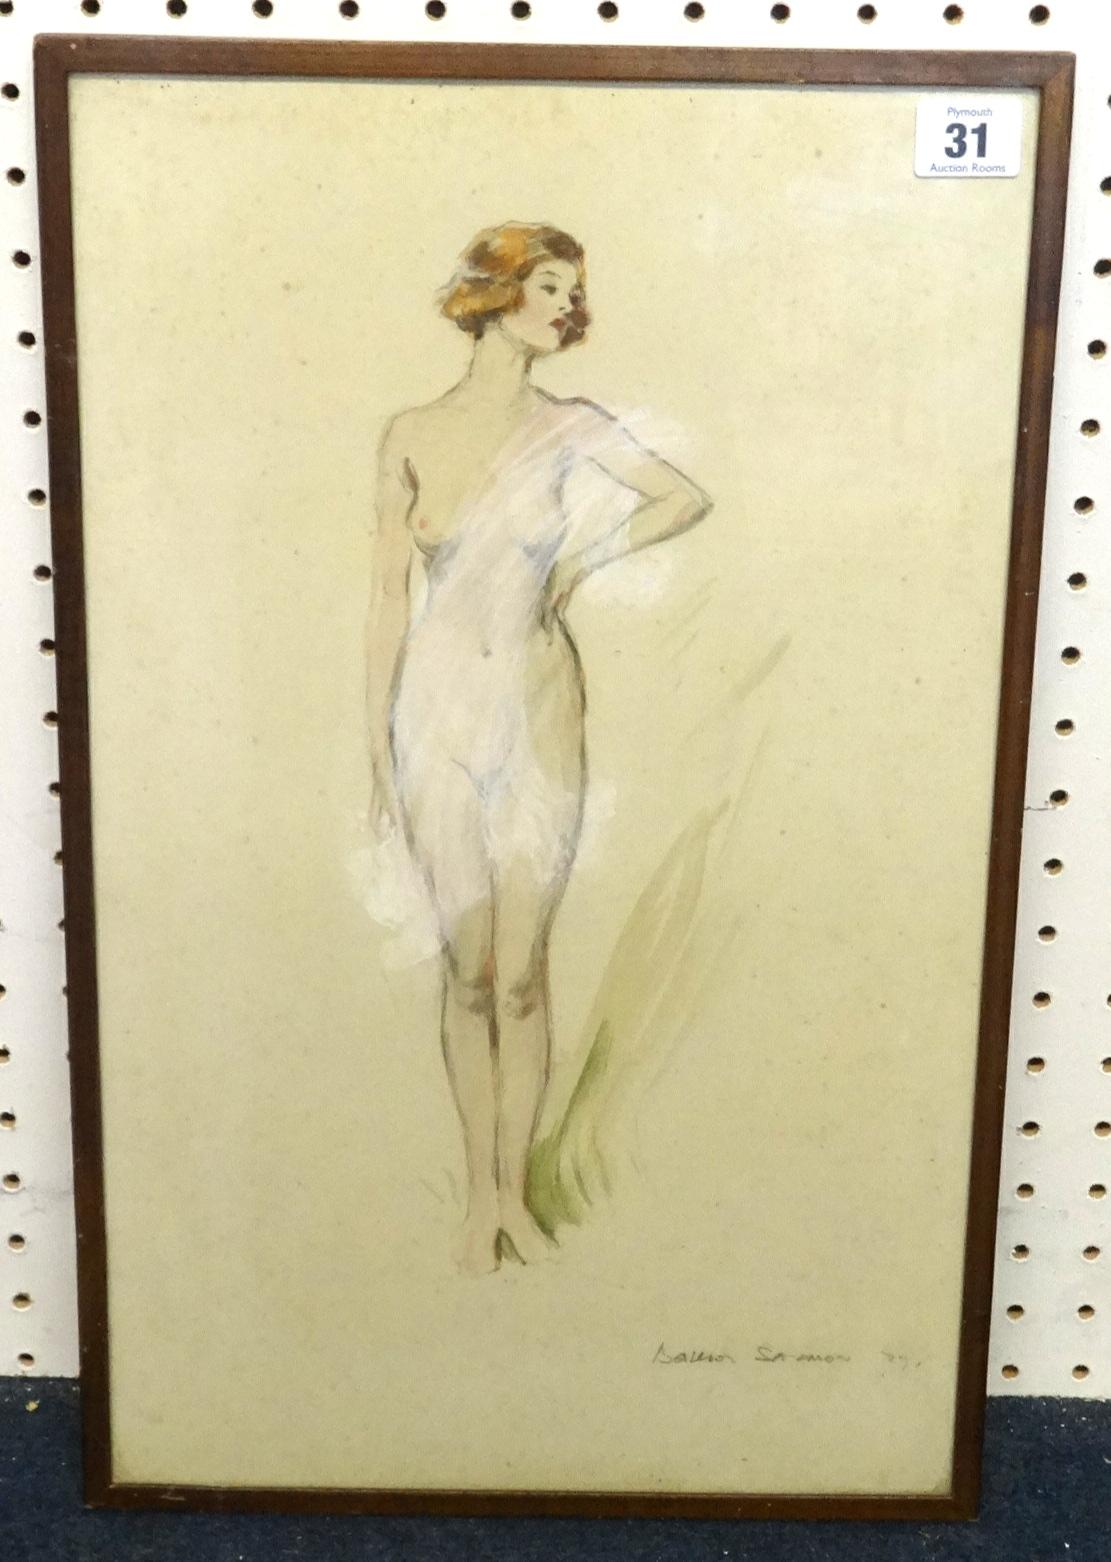 Lot 31 - M.Balliol Salmon (1868-1953) sketch, gouache, Nude Study, 48cm x 30cm.